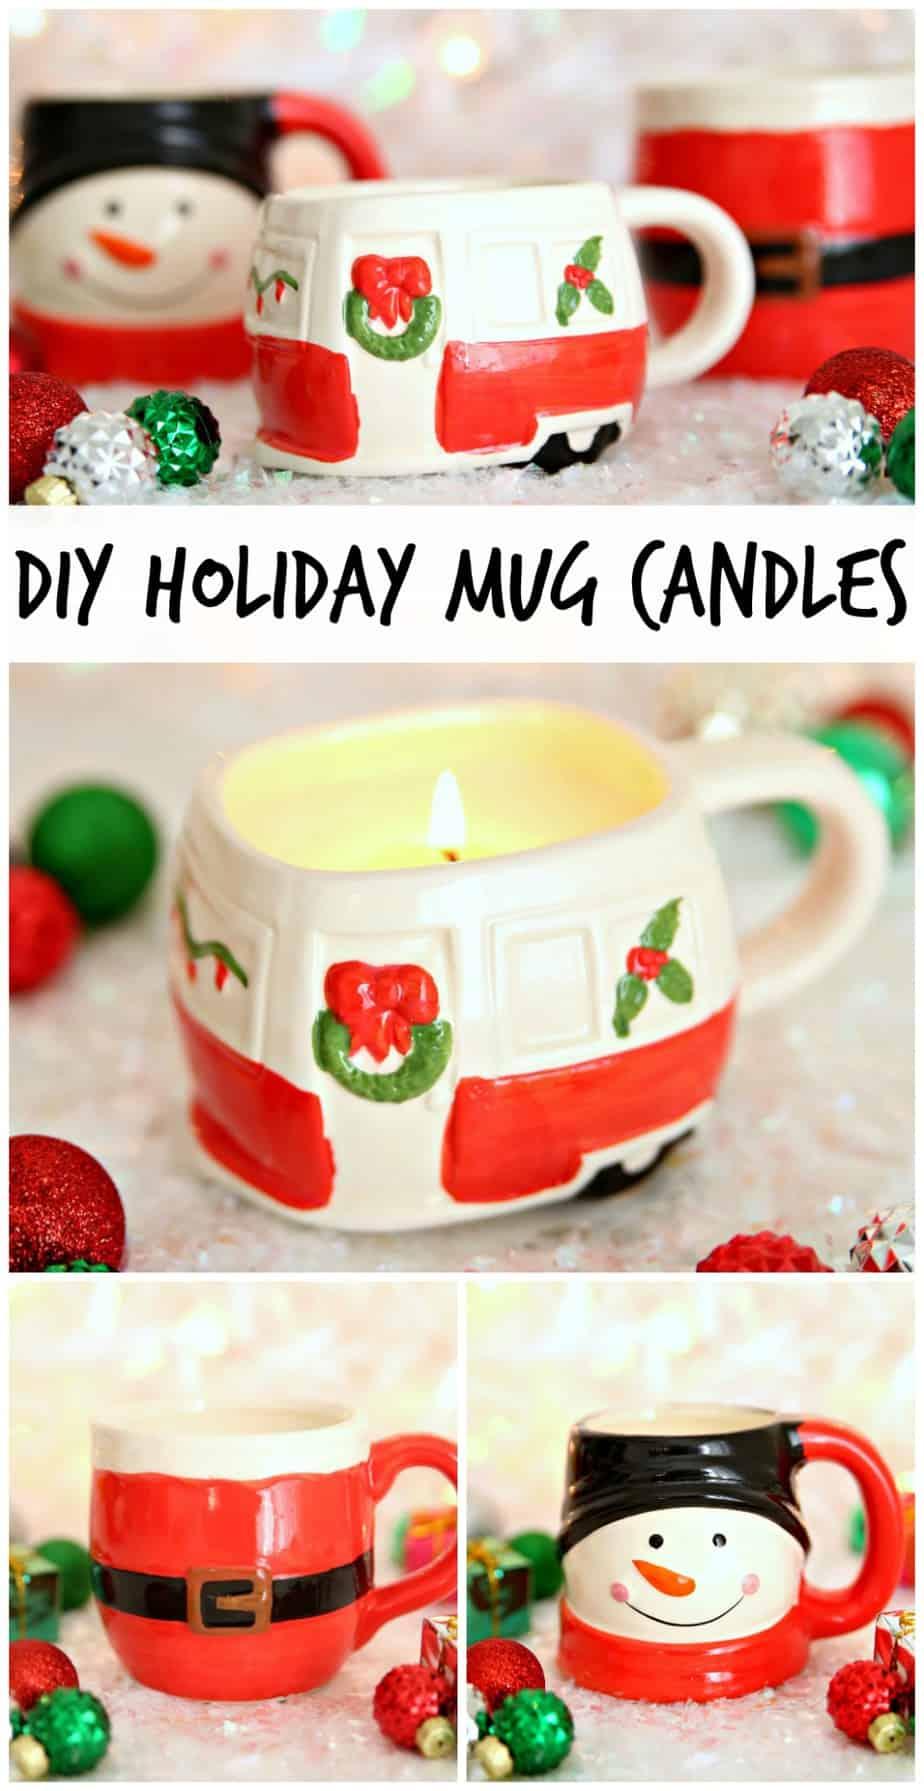 Turn Dollar Store Mugs Into The Cutest Mug Candles